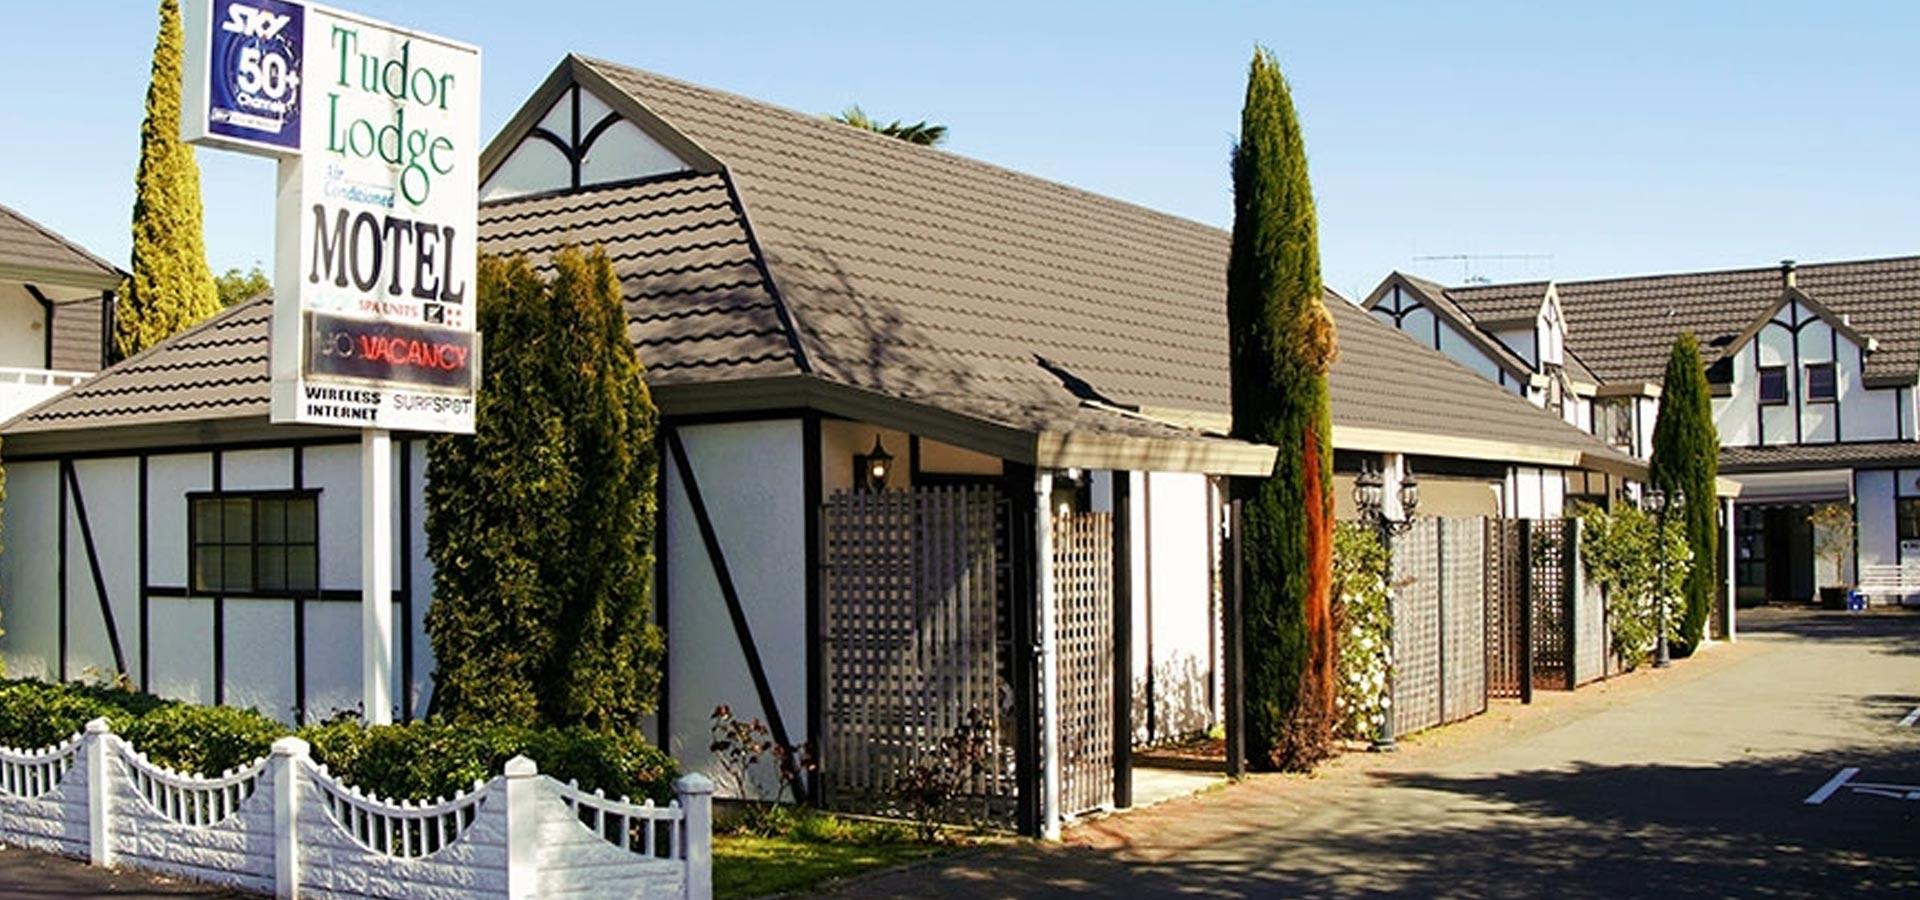 Tudor Lodge Motel, Nelson New Zealand